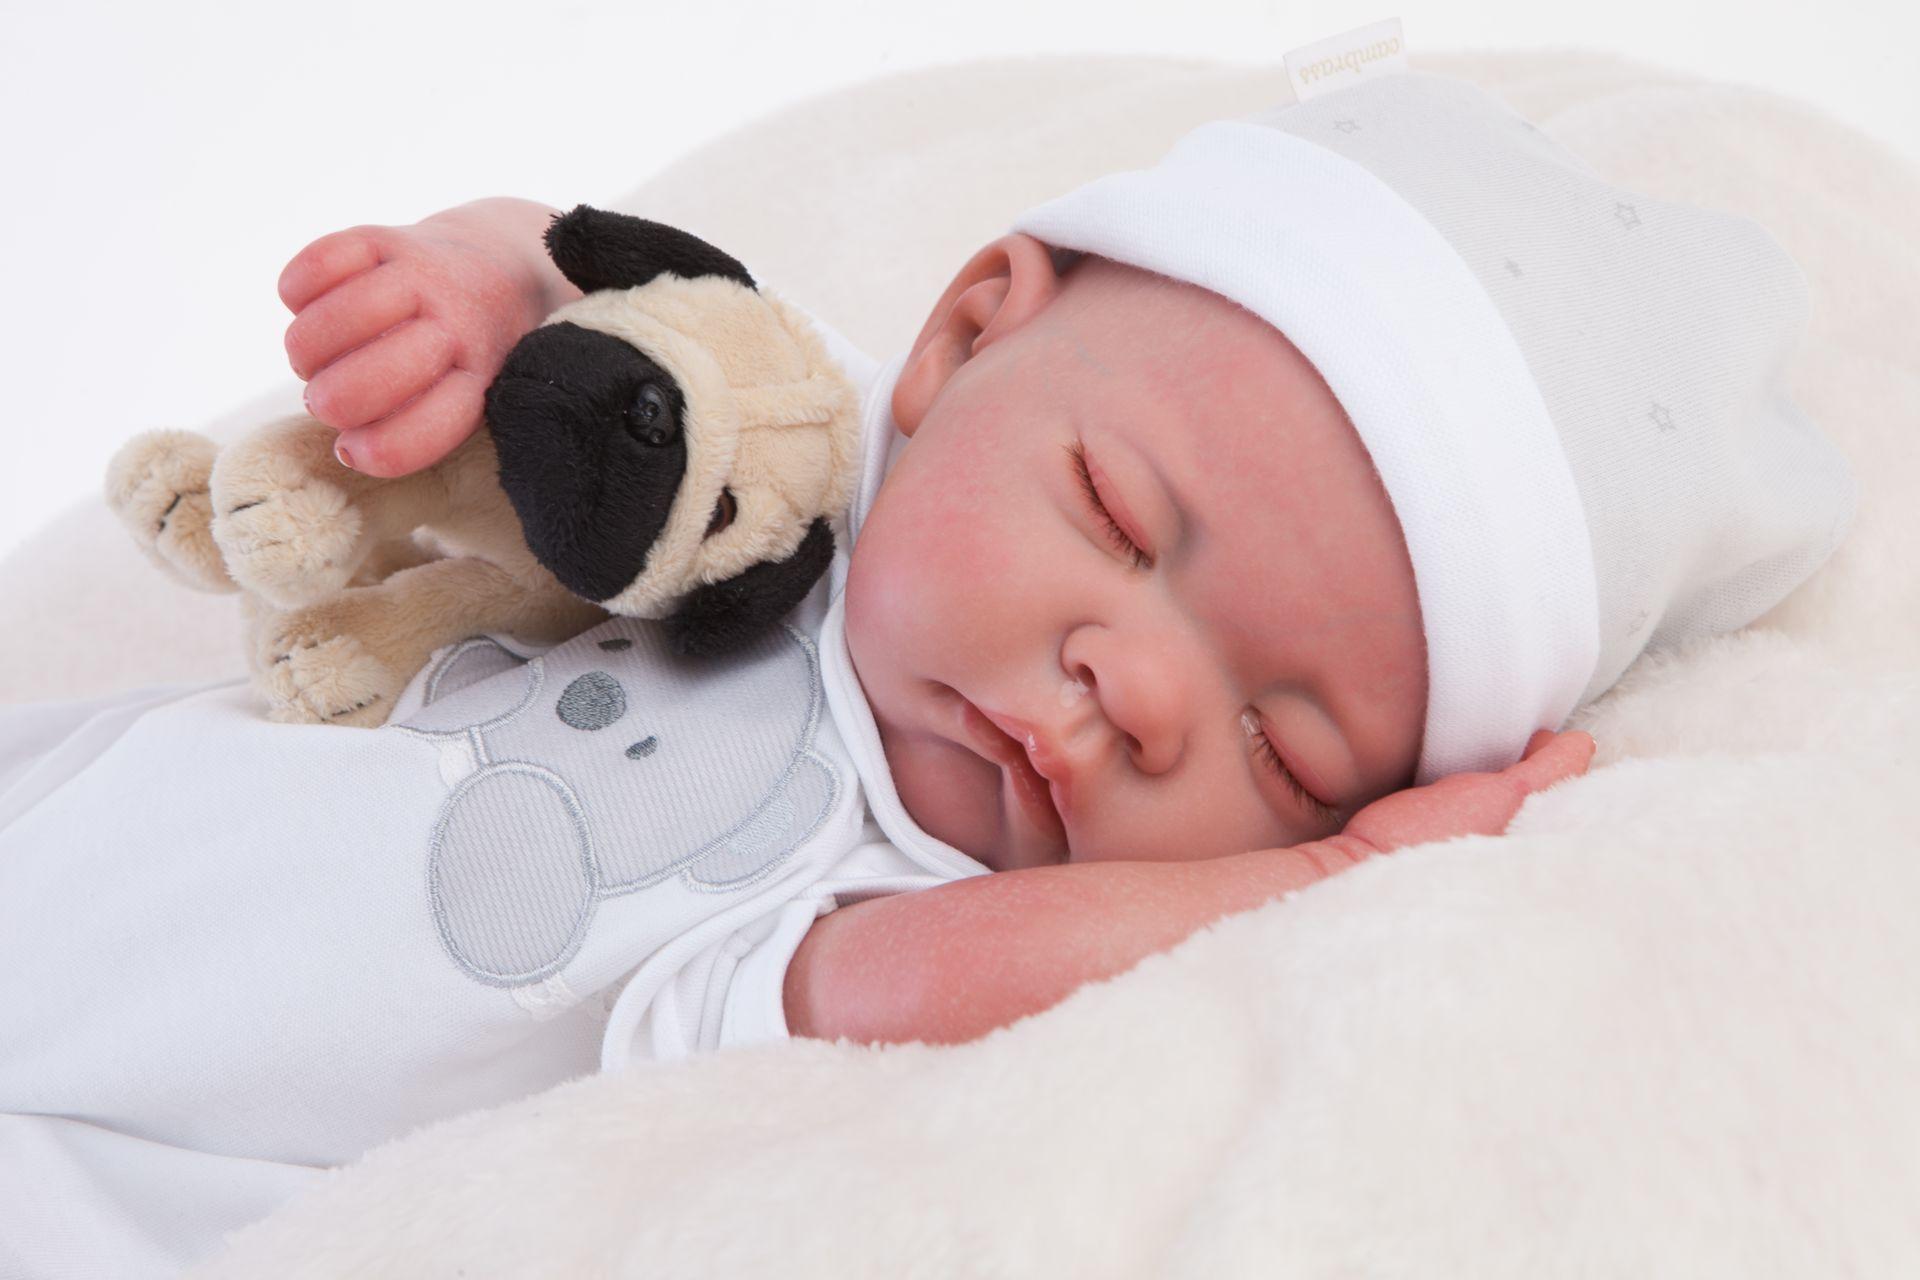 Кукла Реборн младенец Рамон, спящий, 40 смКуклы Антонио Хуан (Antonio Juan Munecas)<br>Кукла Реборн младенец Рамон, спящий, 40 см<br>